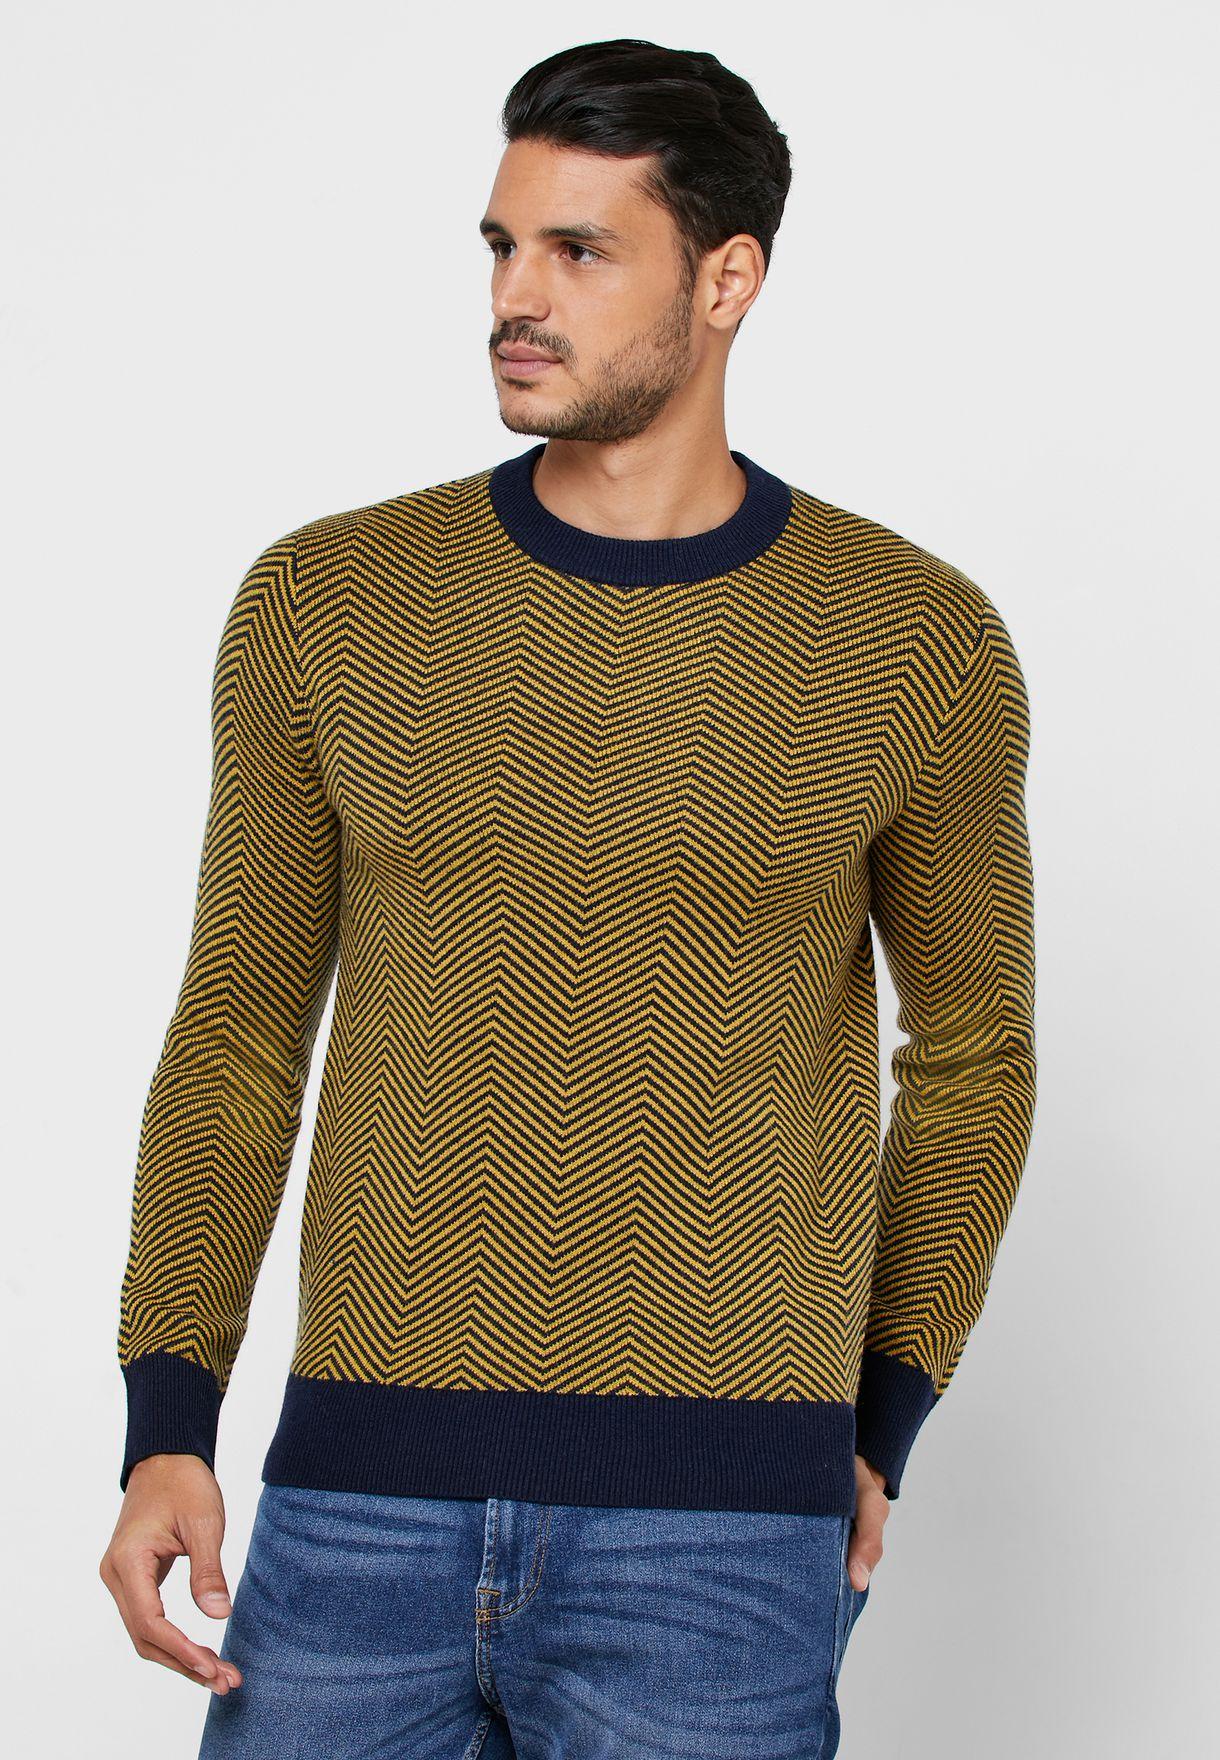 Herring Contrast Edge Sweater